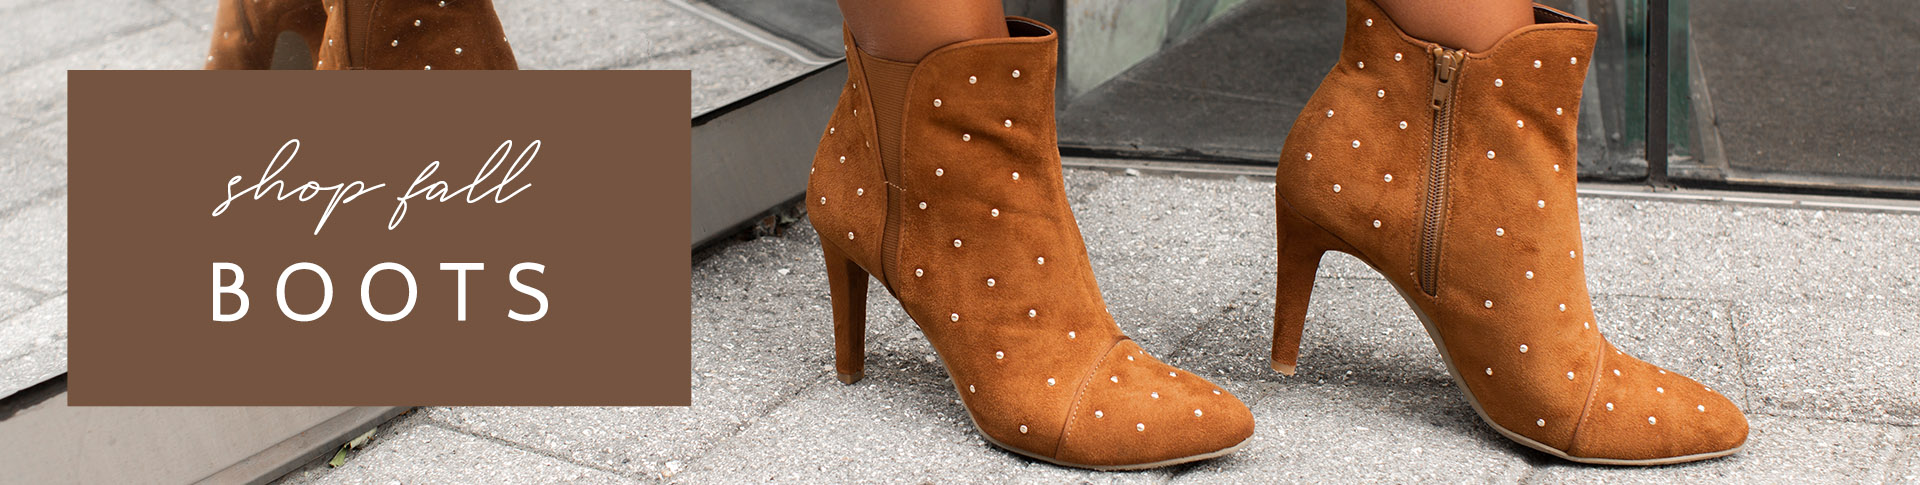 Shop Fall Boots